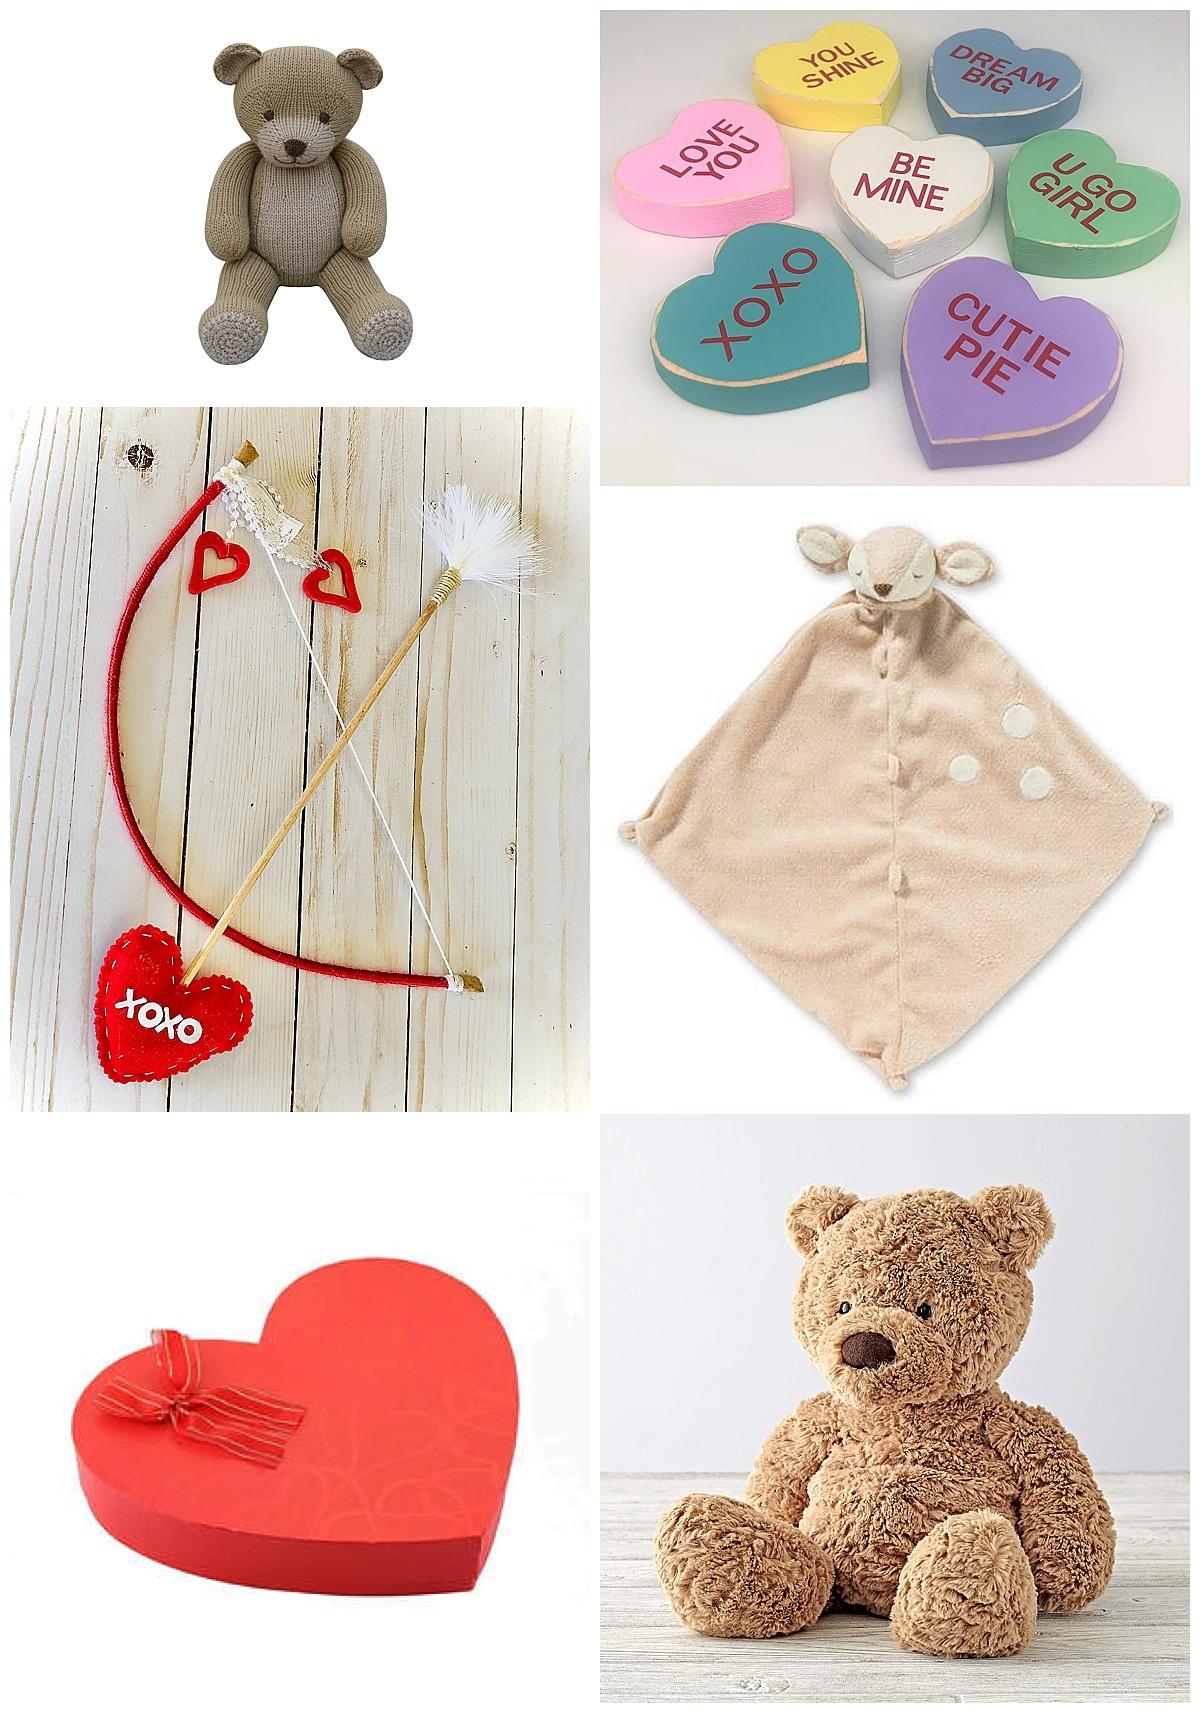 valentine, heart shaped box, teddy bear, lovie